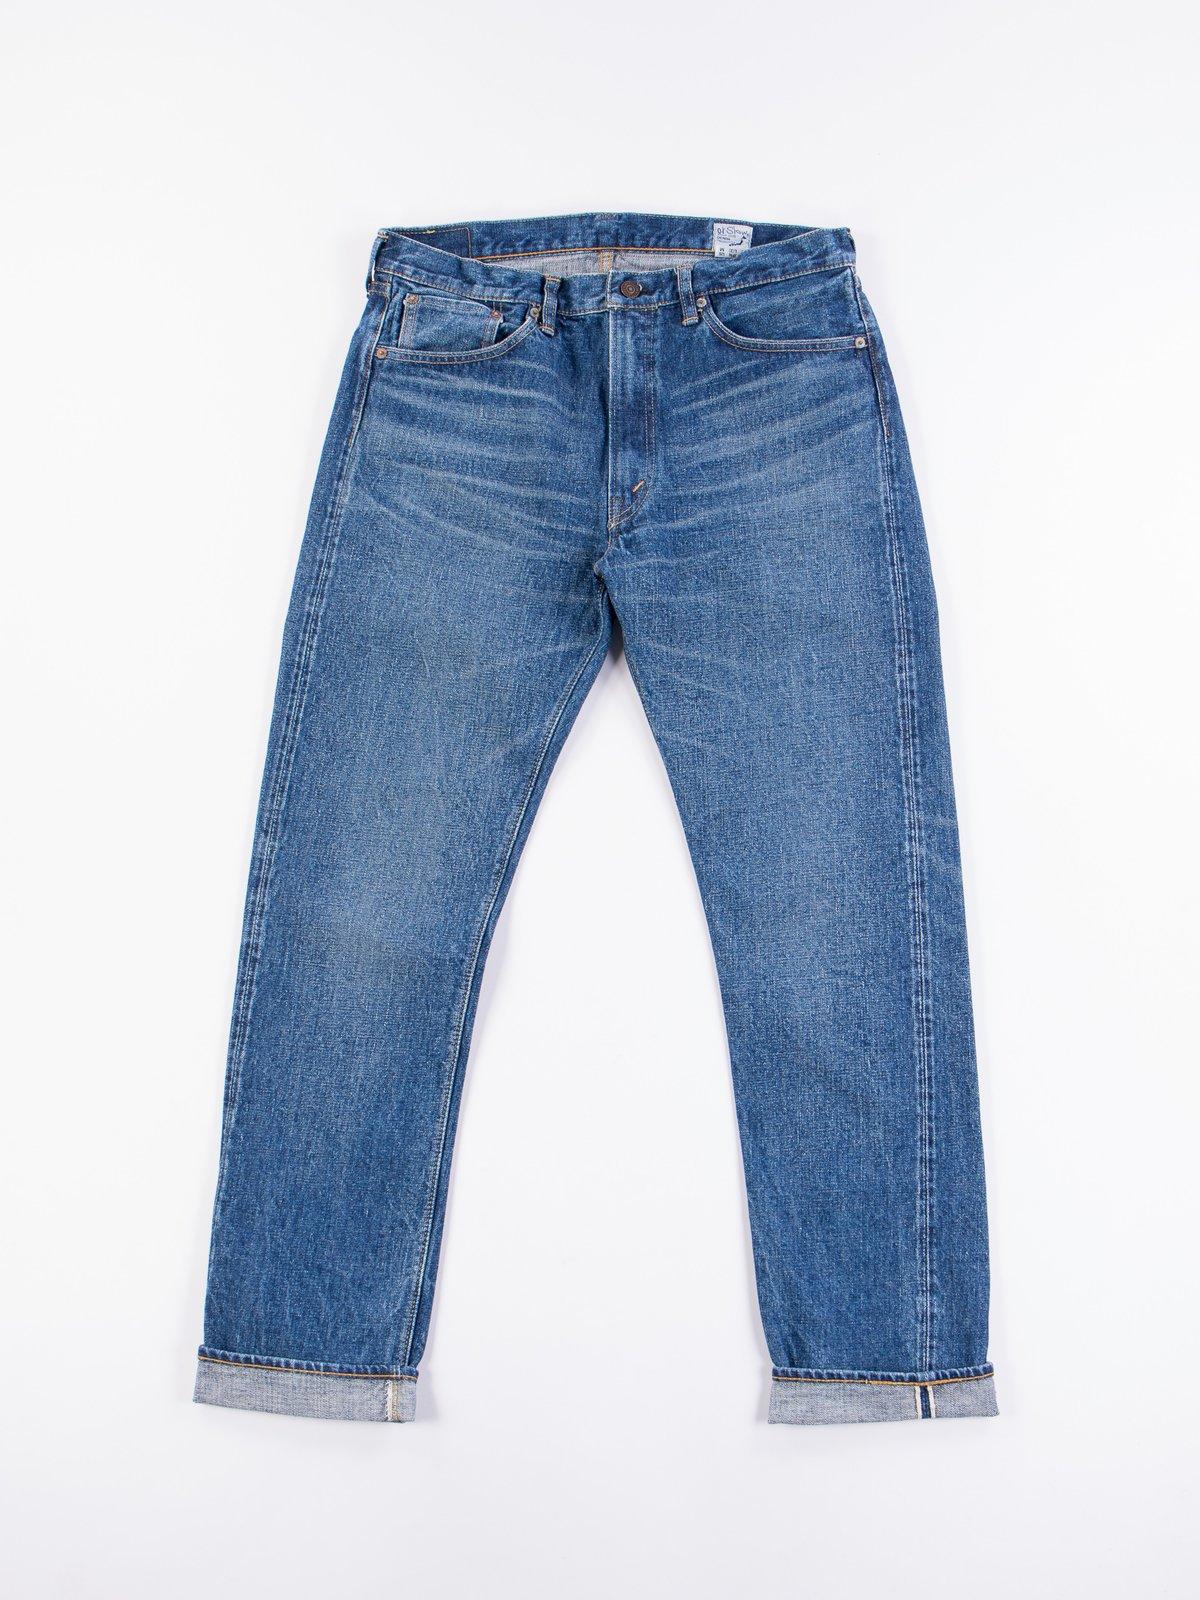 2 Year Wash 107 Slim Fit Jean - Image 1